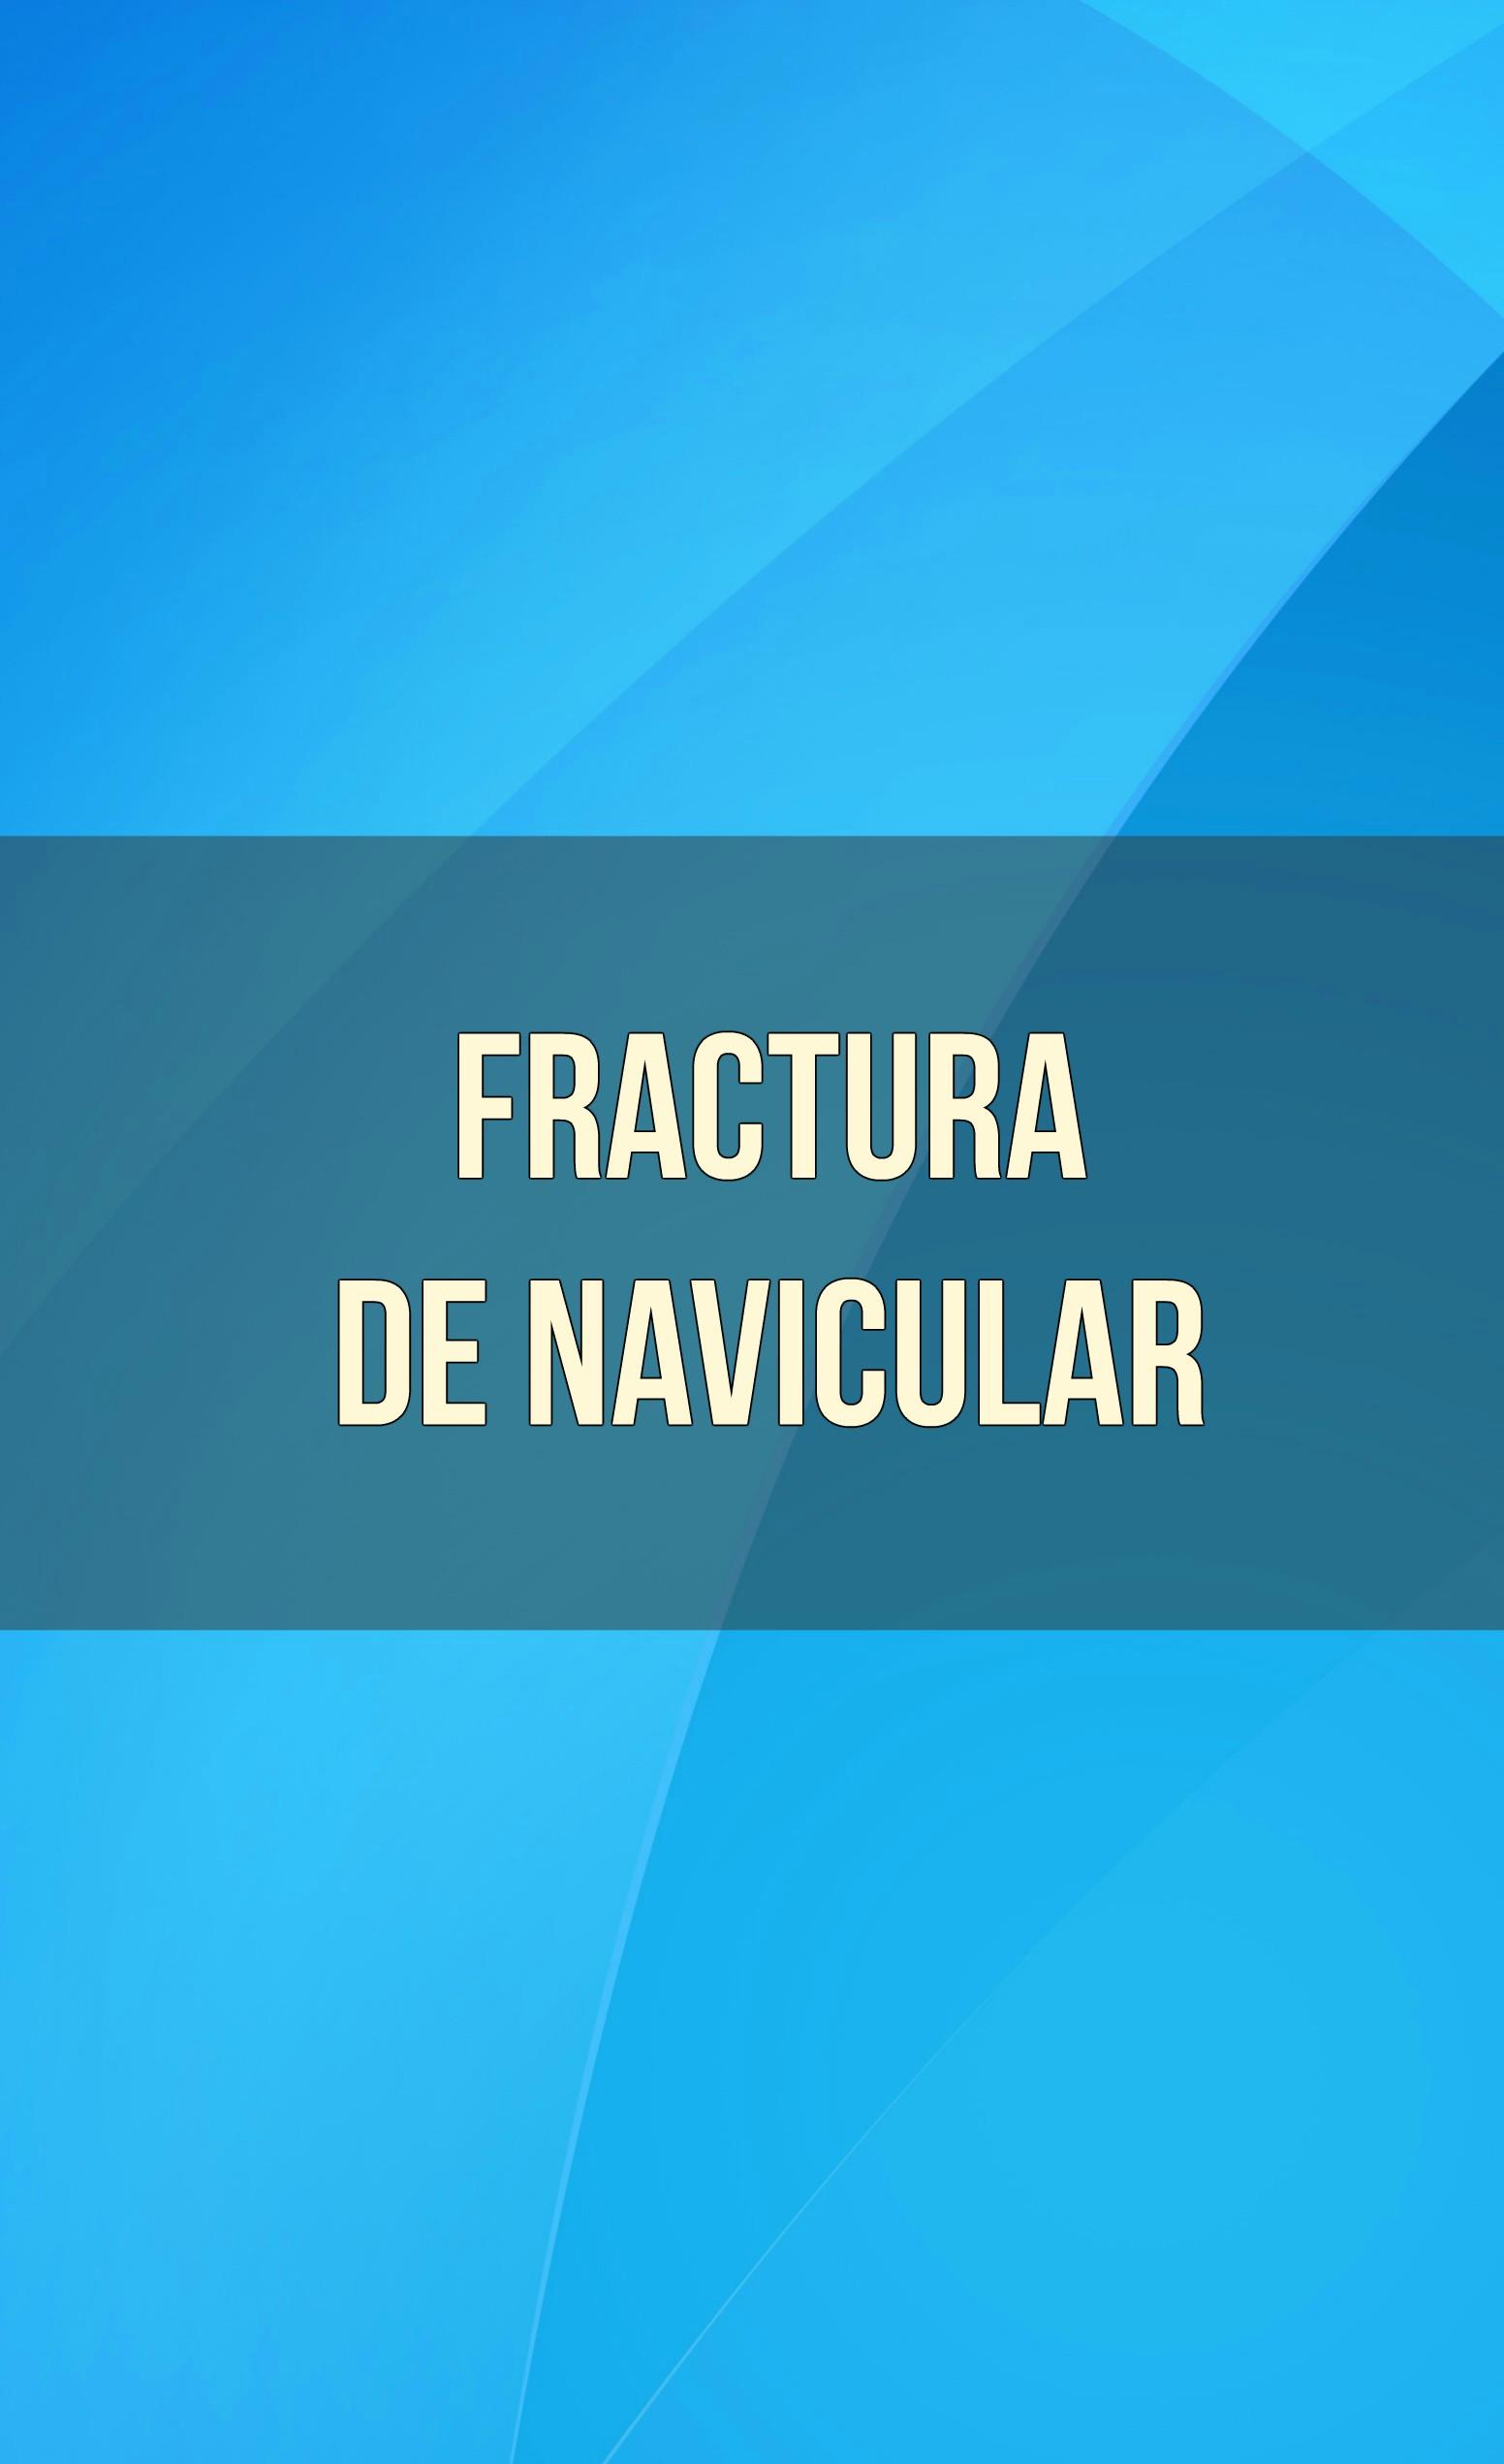 fractura de navicular